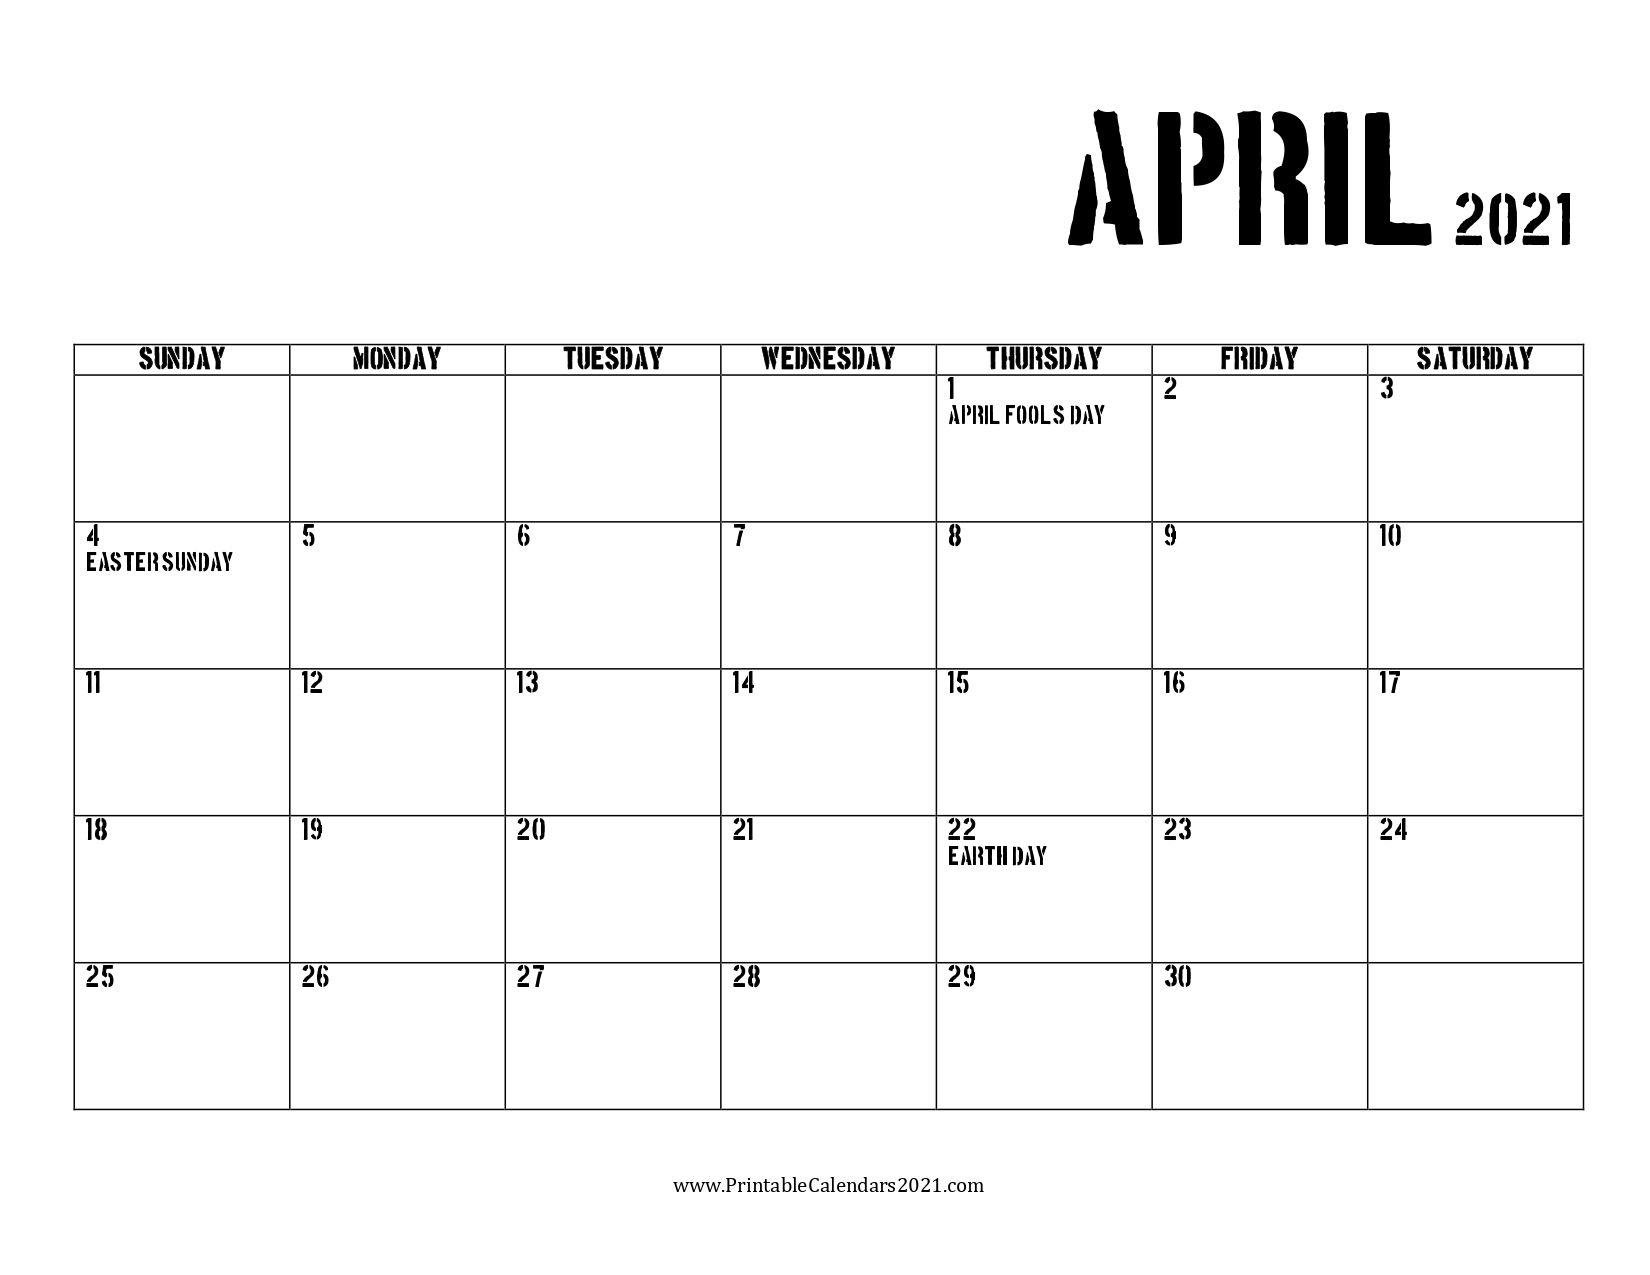 65 april 2021 calendar printable with holidays, blank